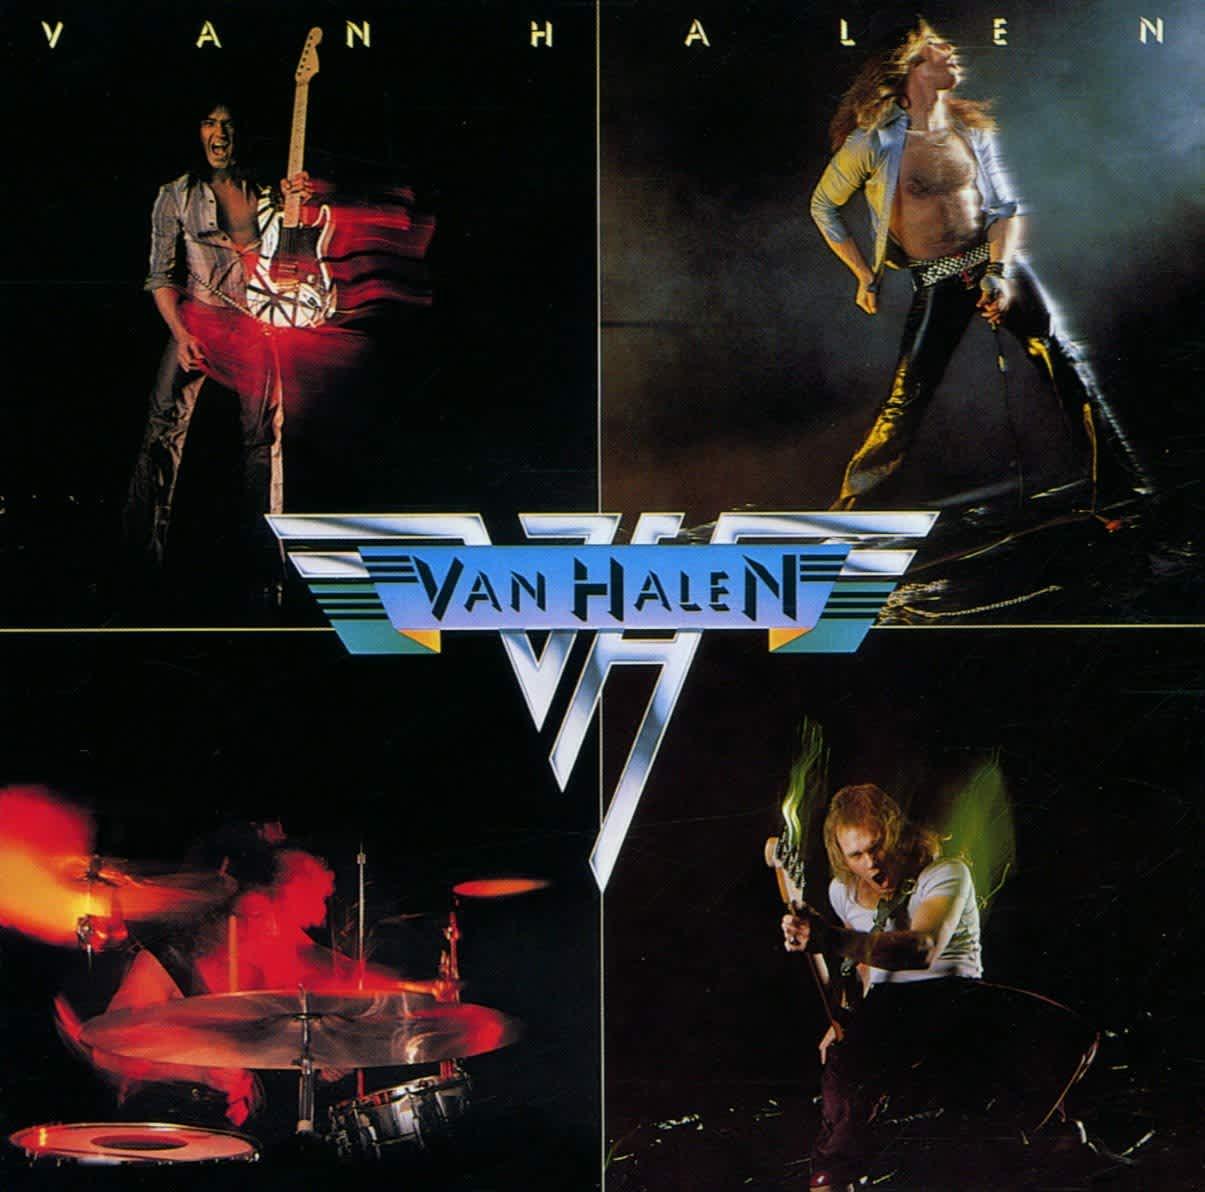 RIP Eddie Van Halen